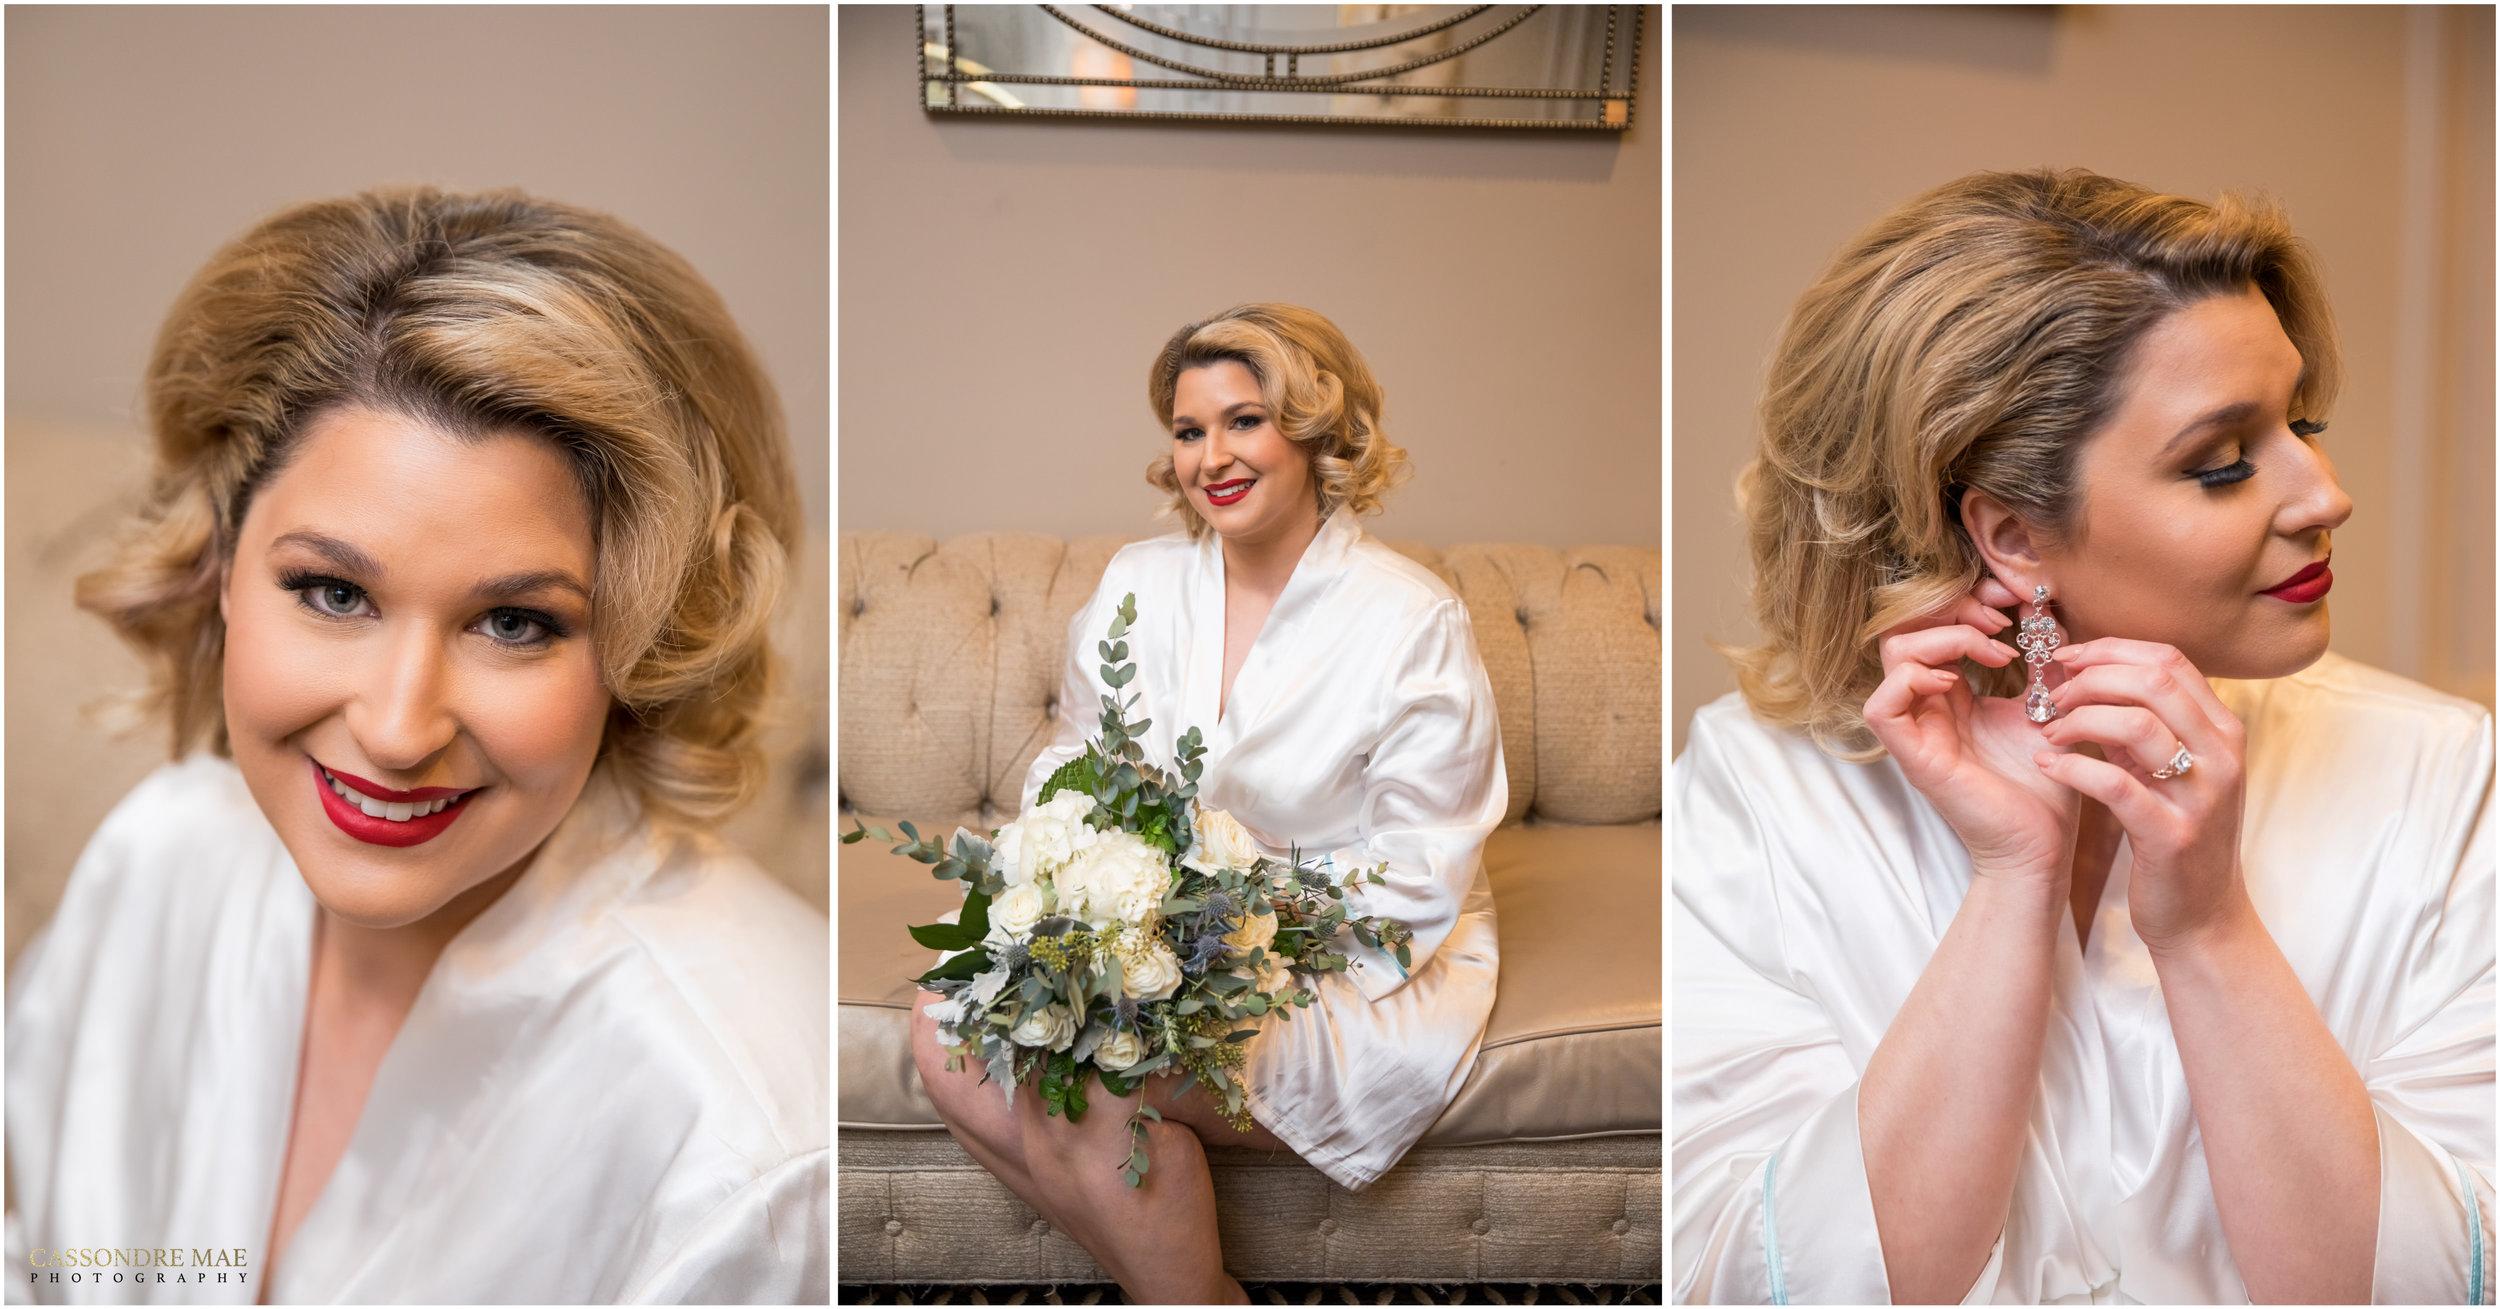 Cassondre Mae Photography Poughkeepsie NY Wedding 5.jpg